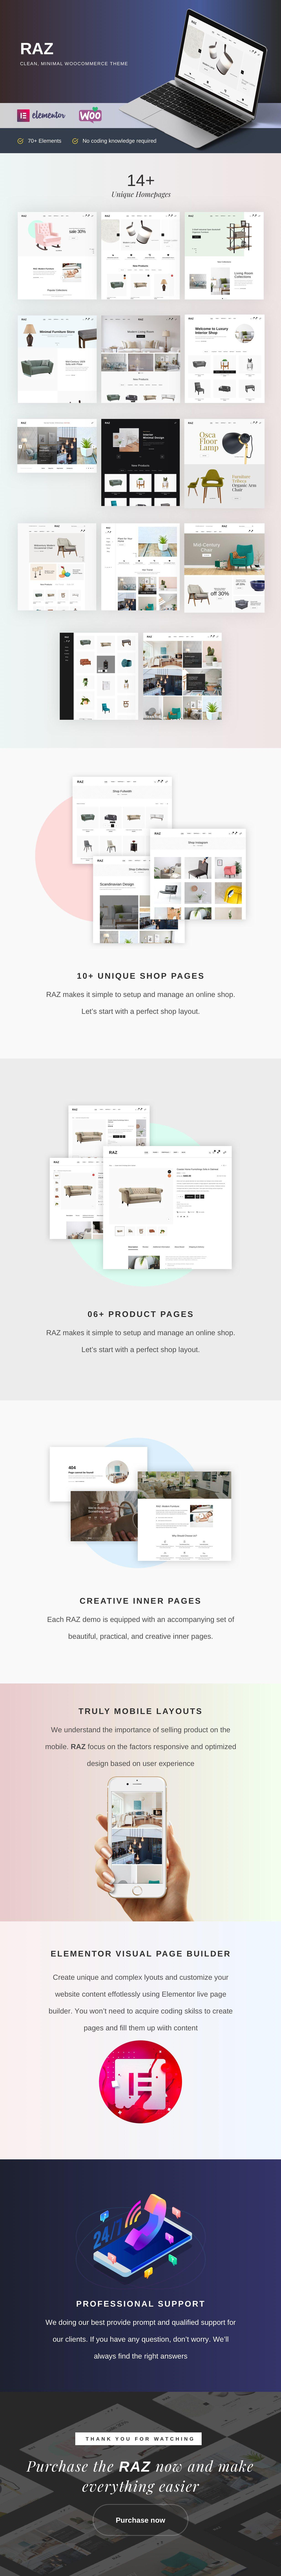 Raz - Clean, Minimal WooCommerce Theme - 2